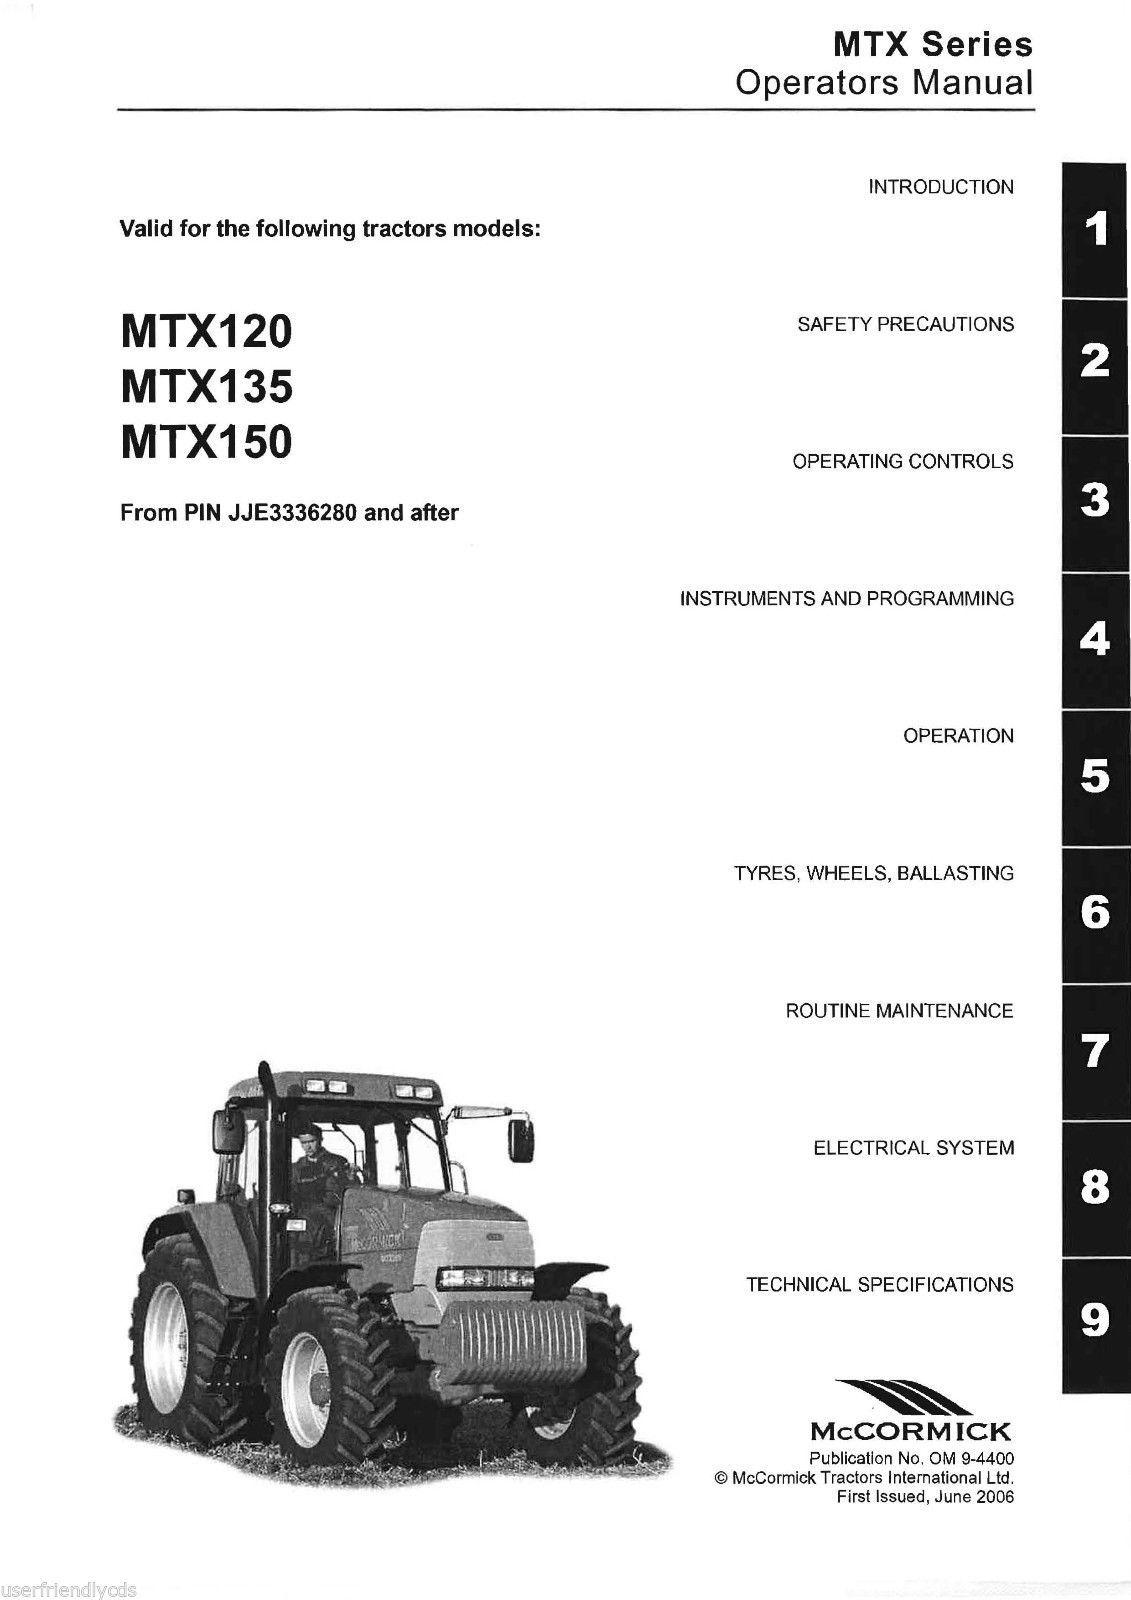 McCormick MTX MTX135 MTX140 MTX150 Tractor Service & Operator Manual -4- MANUALS image 8